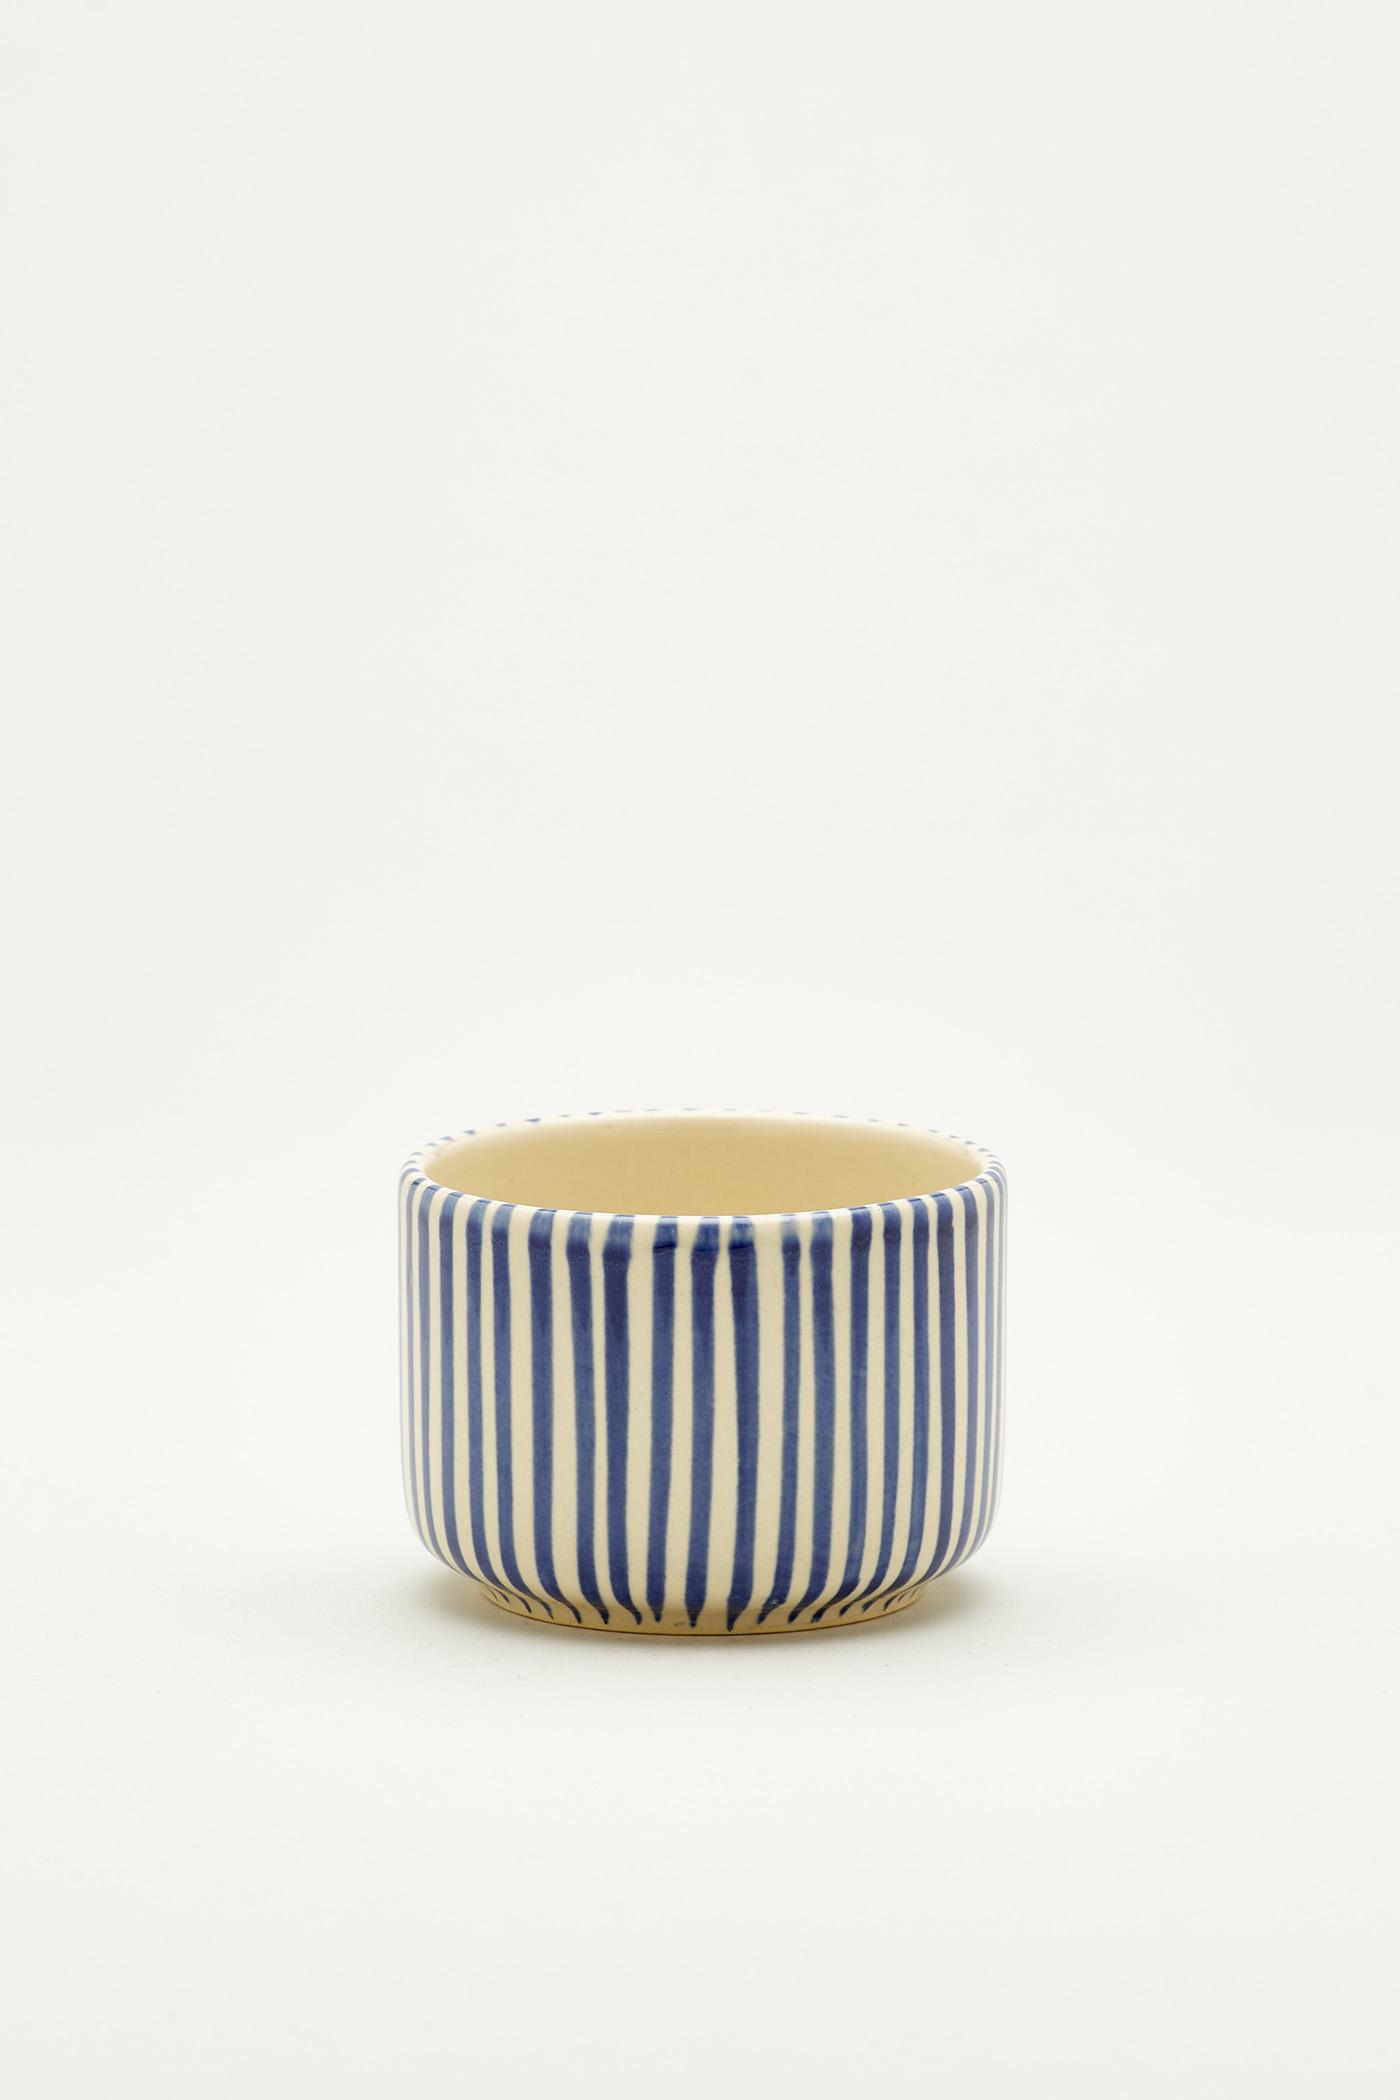 Tuhu Ceramics English Cereal Bowl